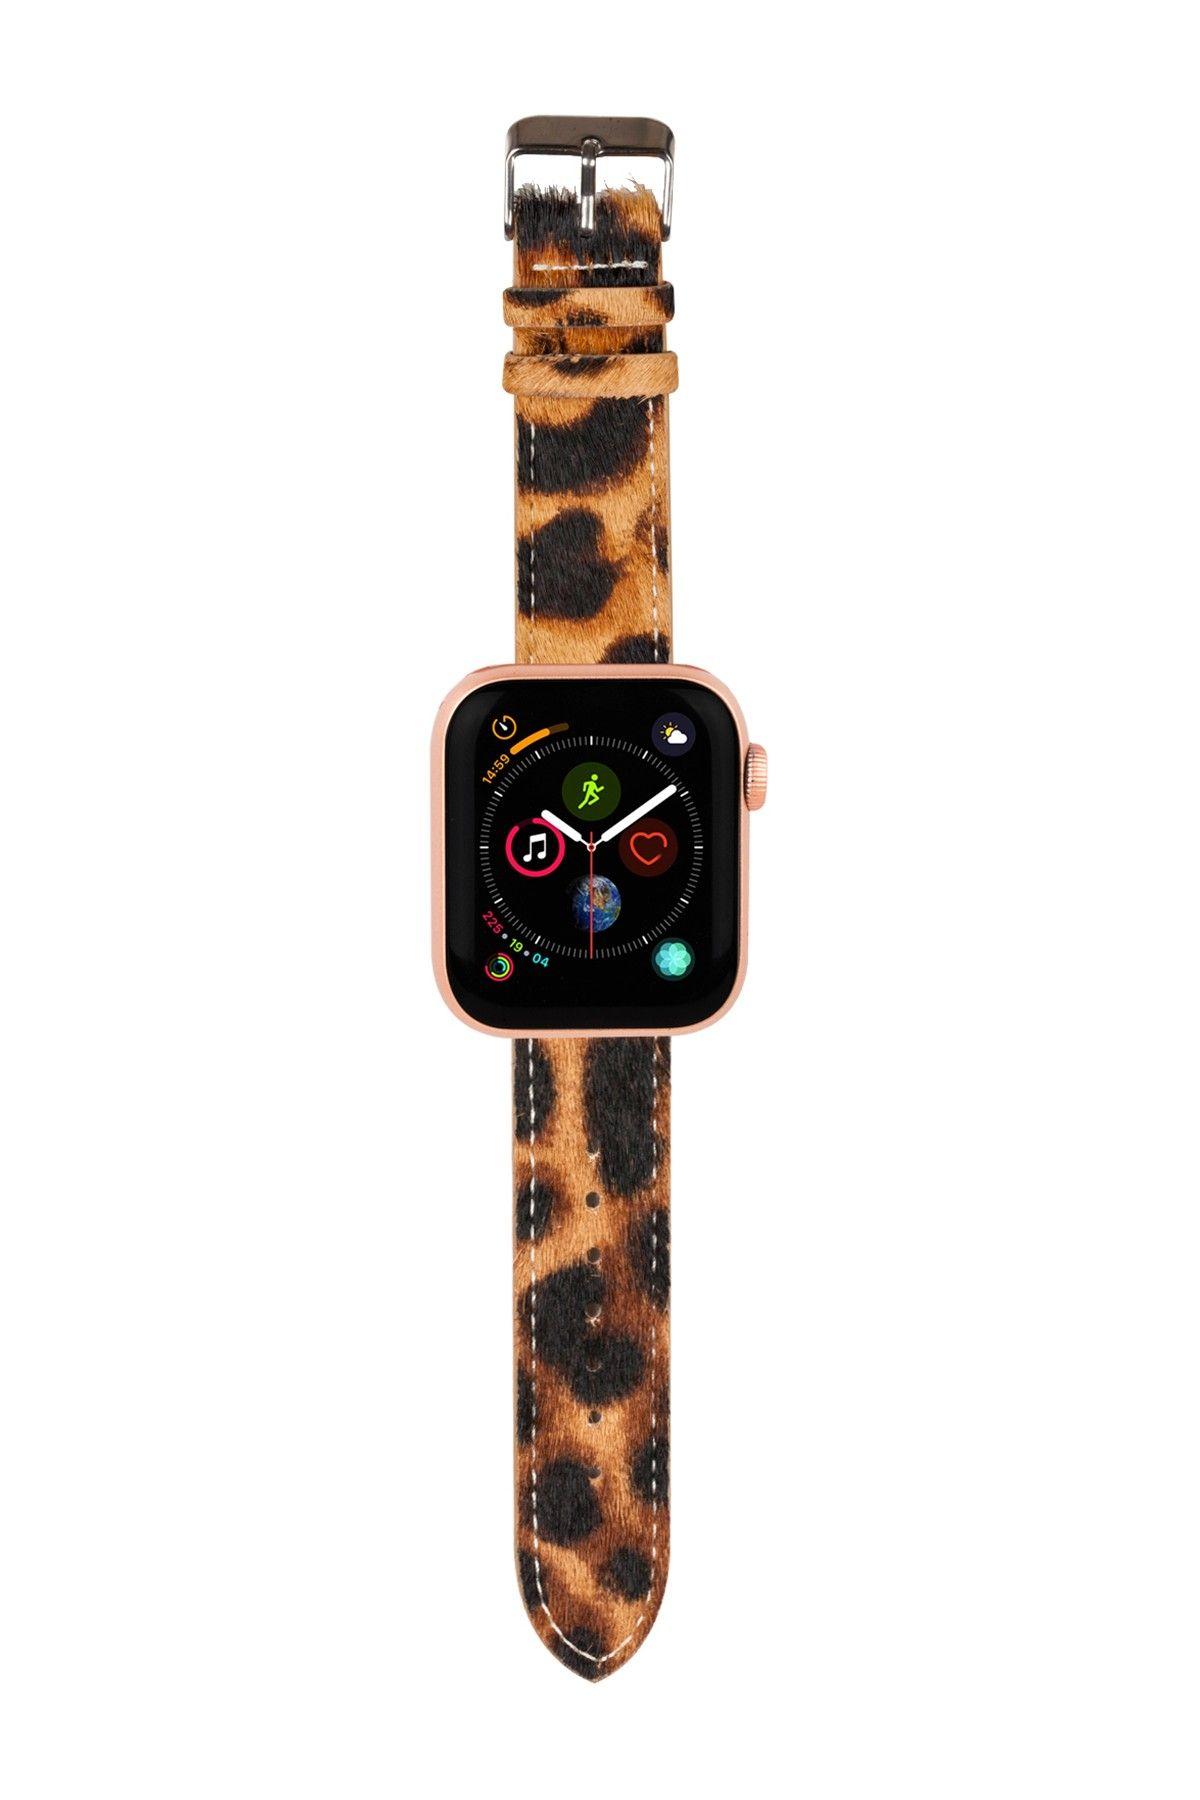 CYLO Cheetah Apple Watch Strap Apple watch strap